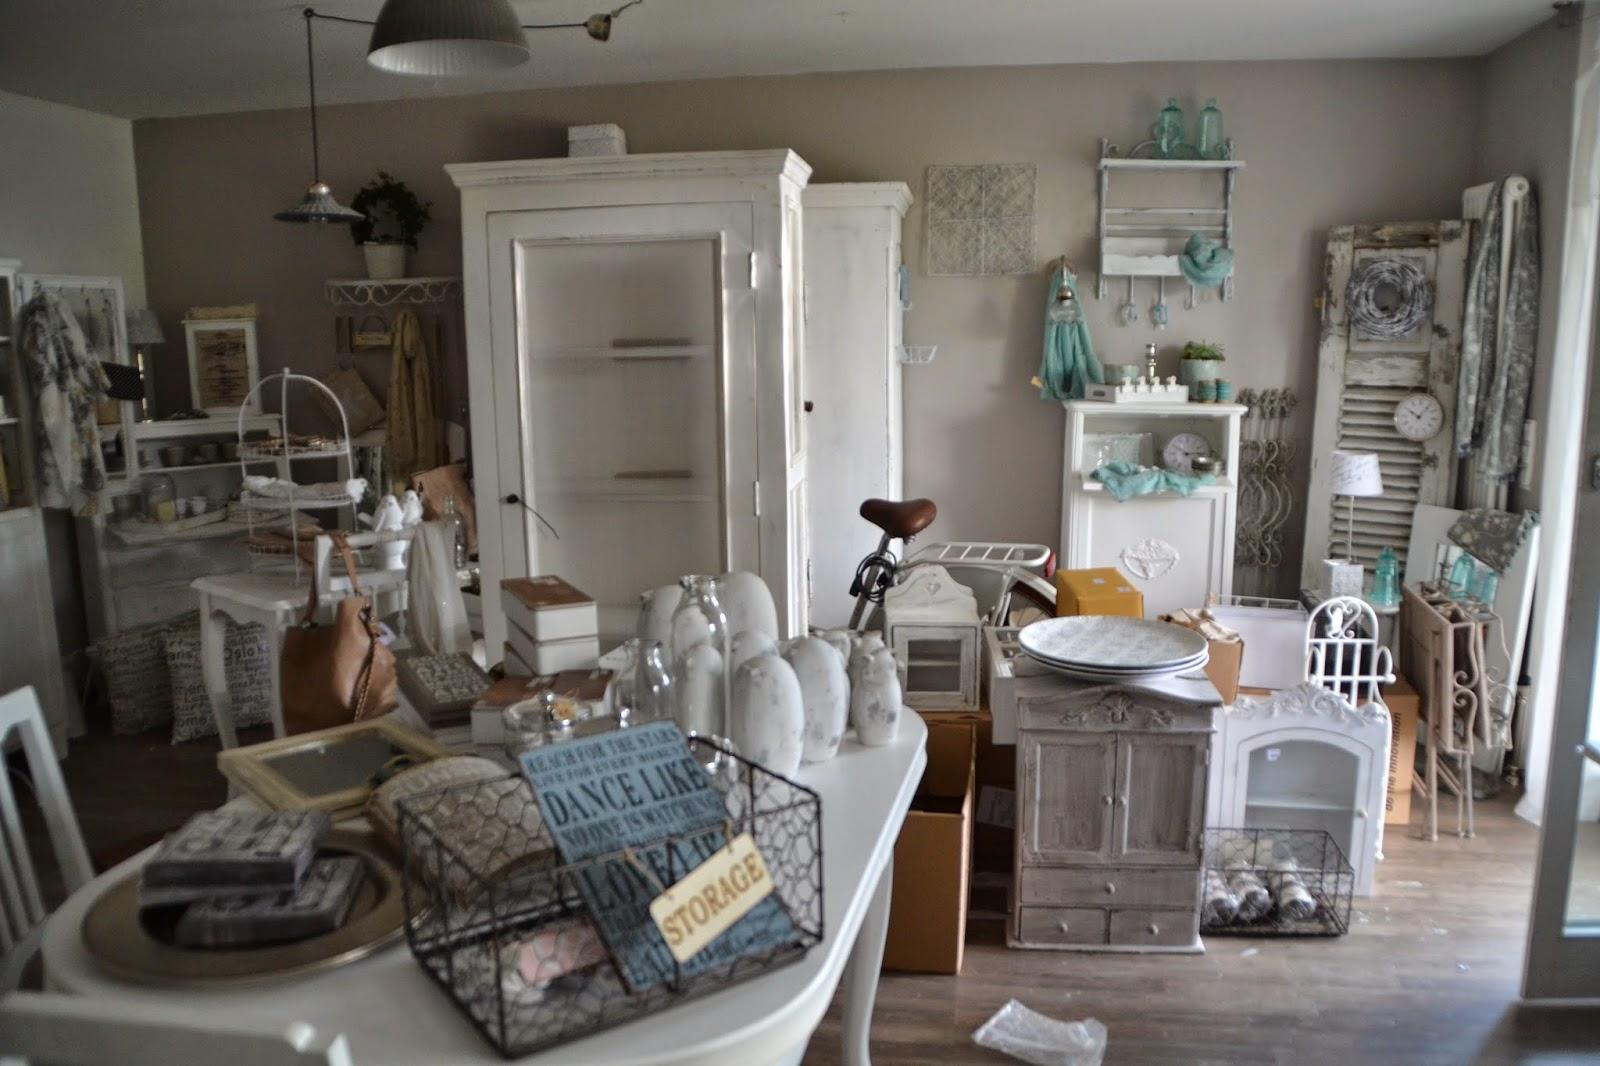 shopping in venlo in den niederlanden kaffee zigaretten dosen. Black Bedroom Furniture Sets. Home Design Ideas